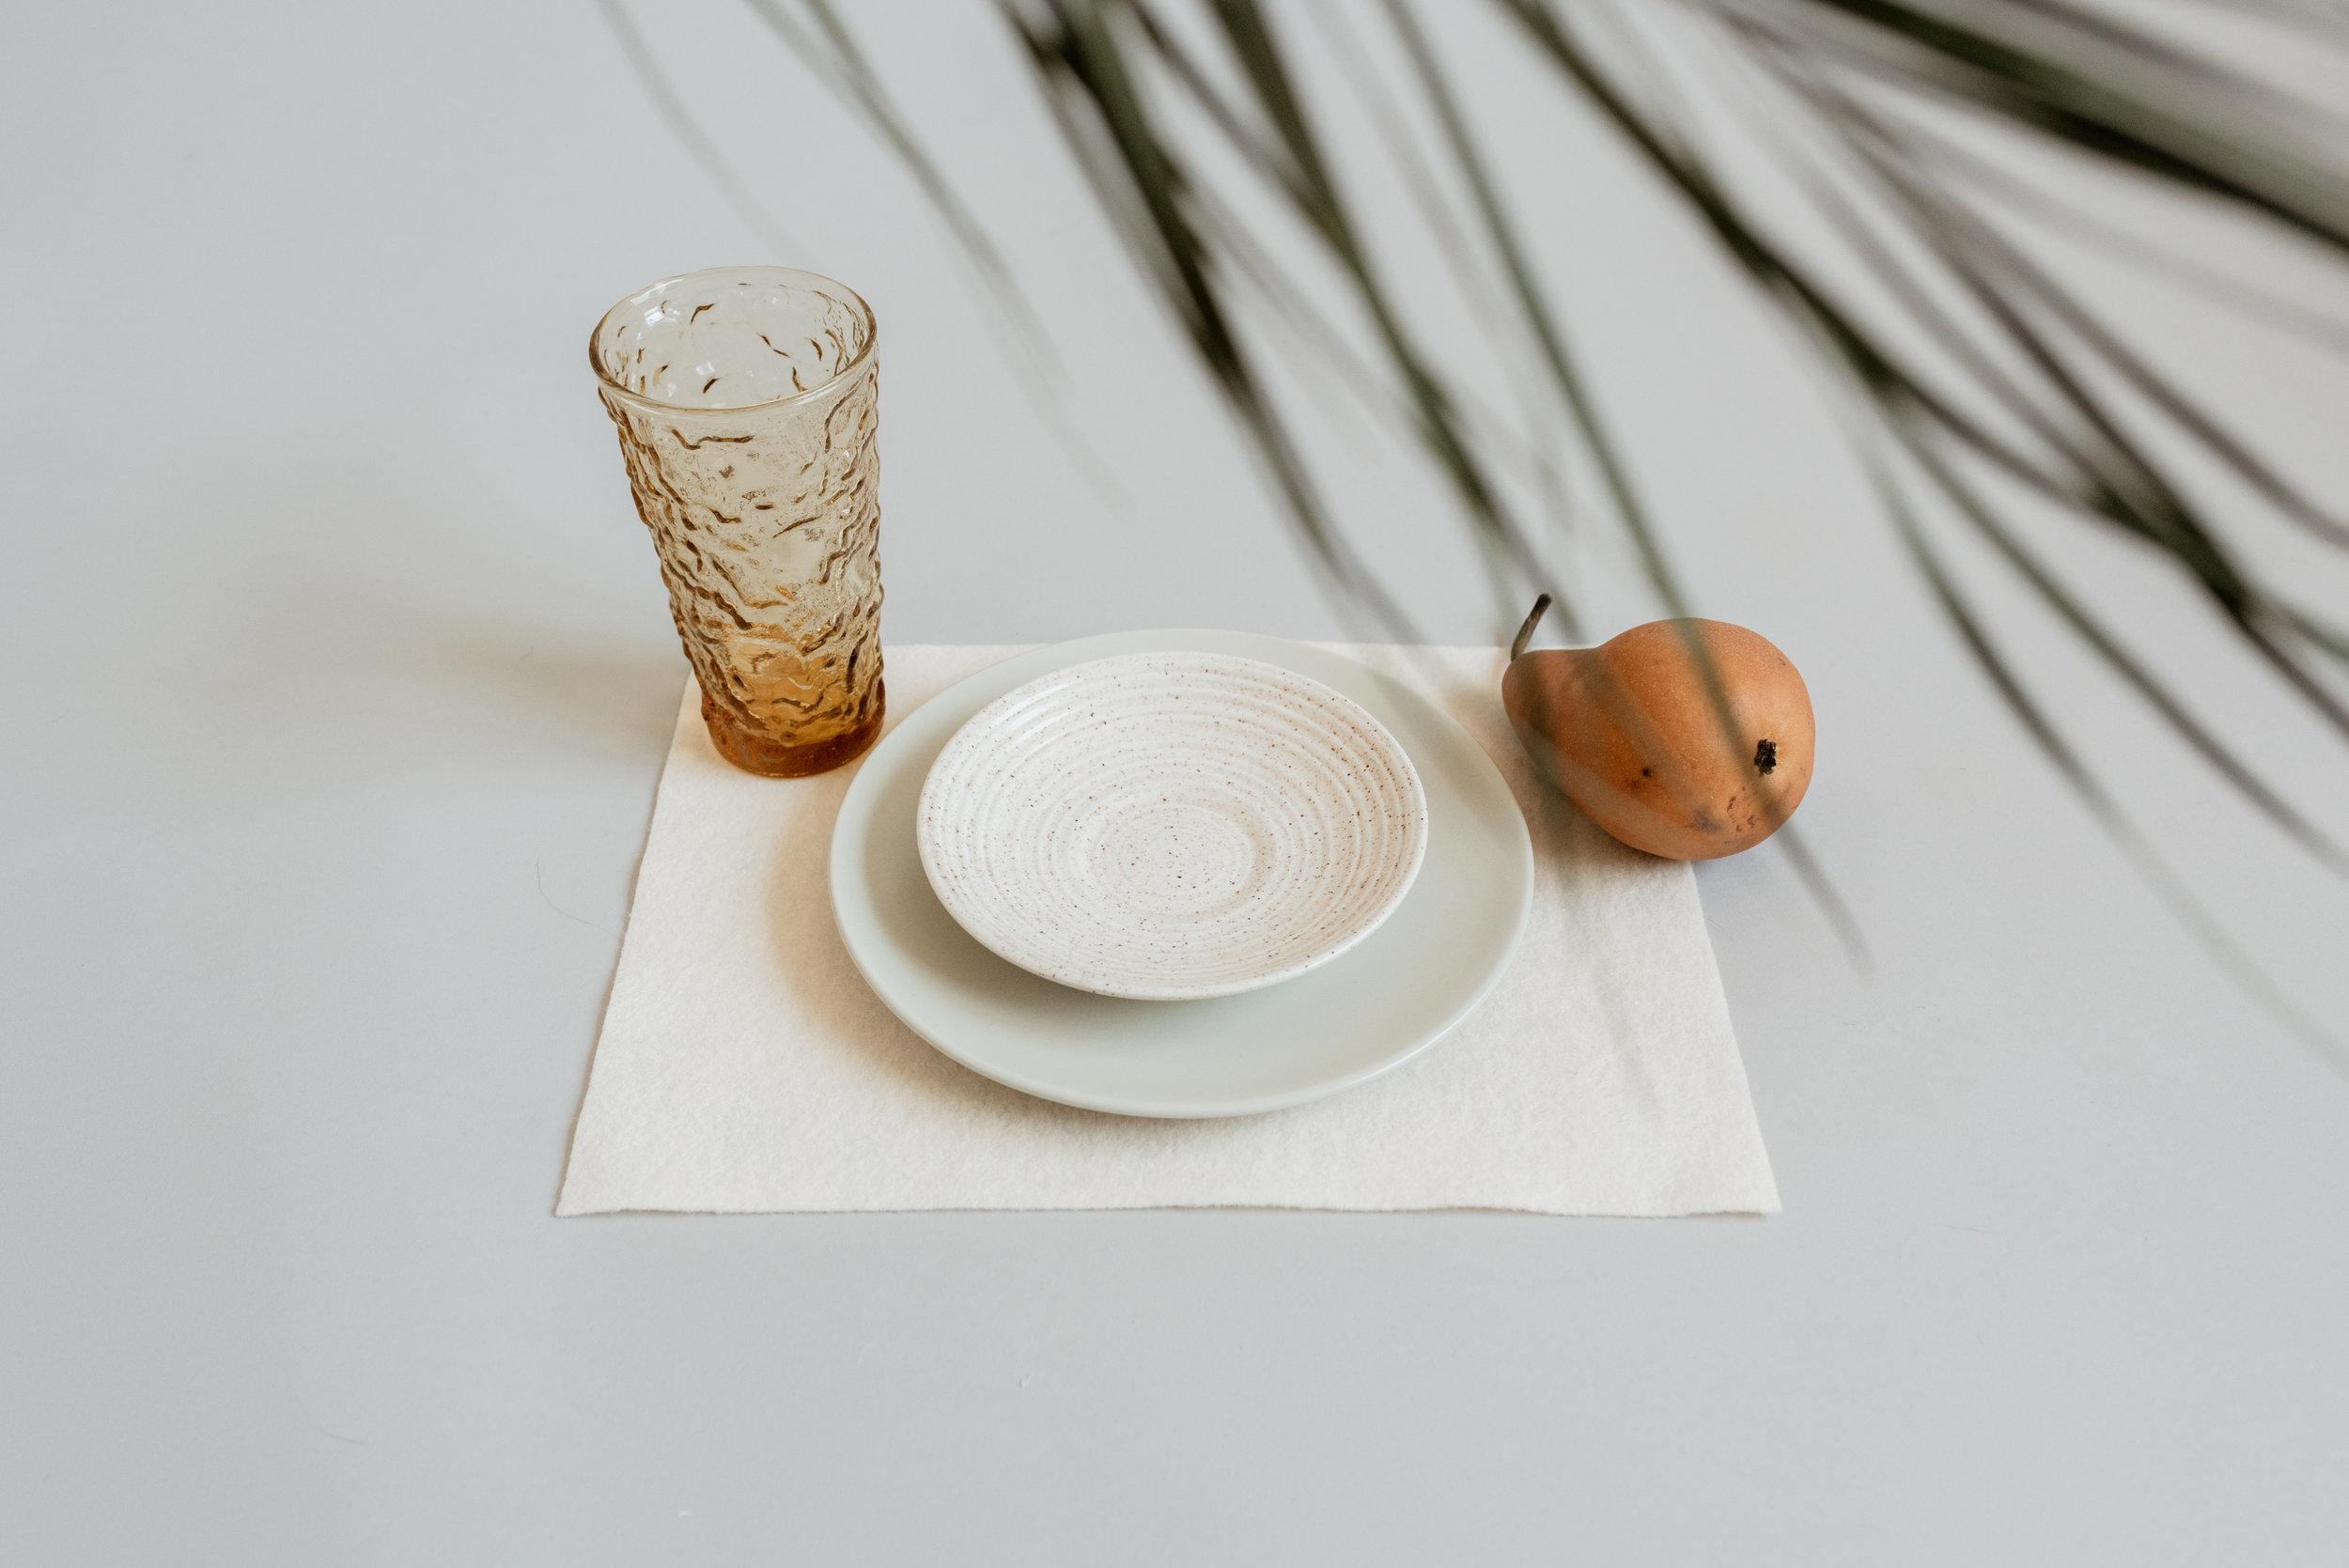 pastel-plates-43.jpg